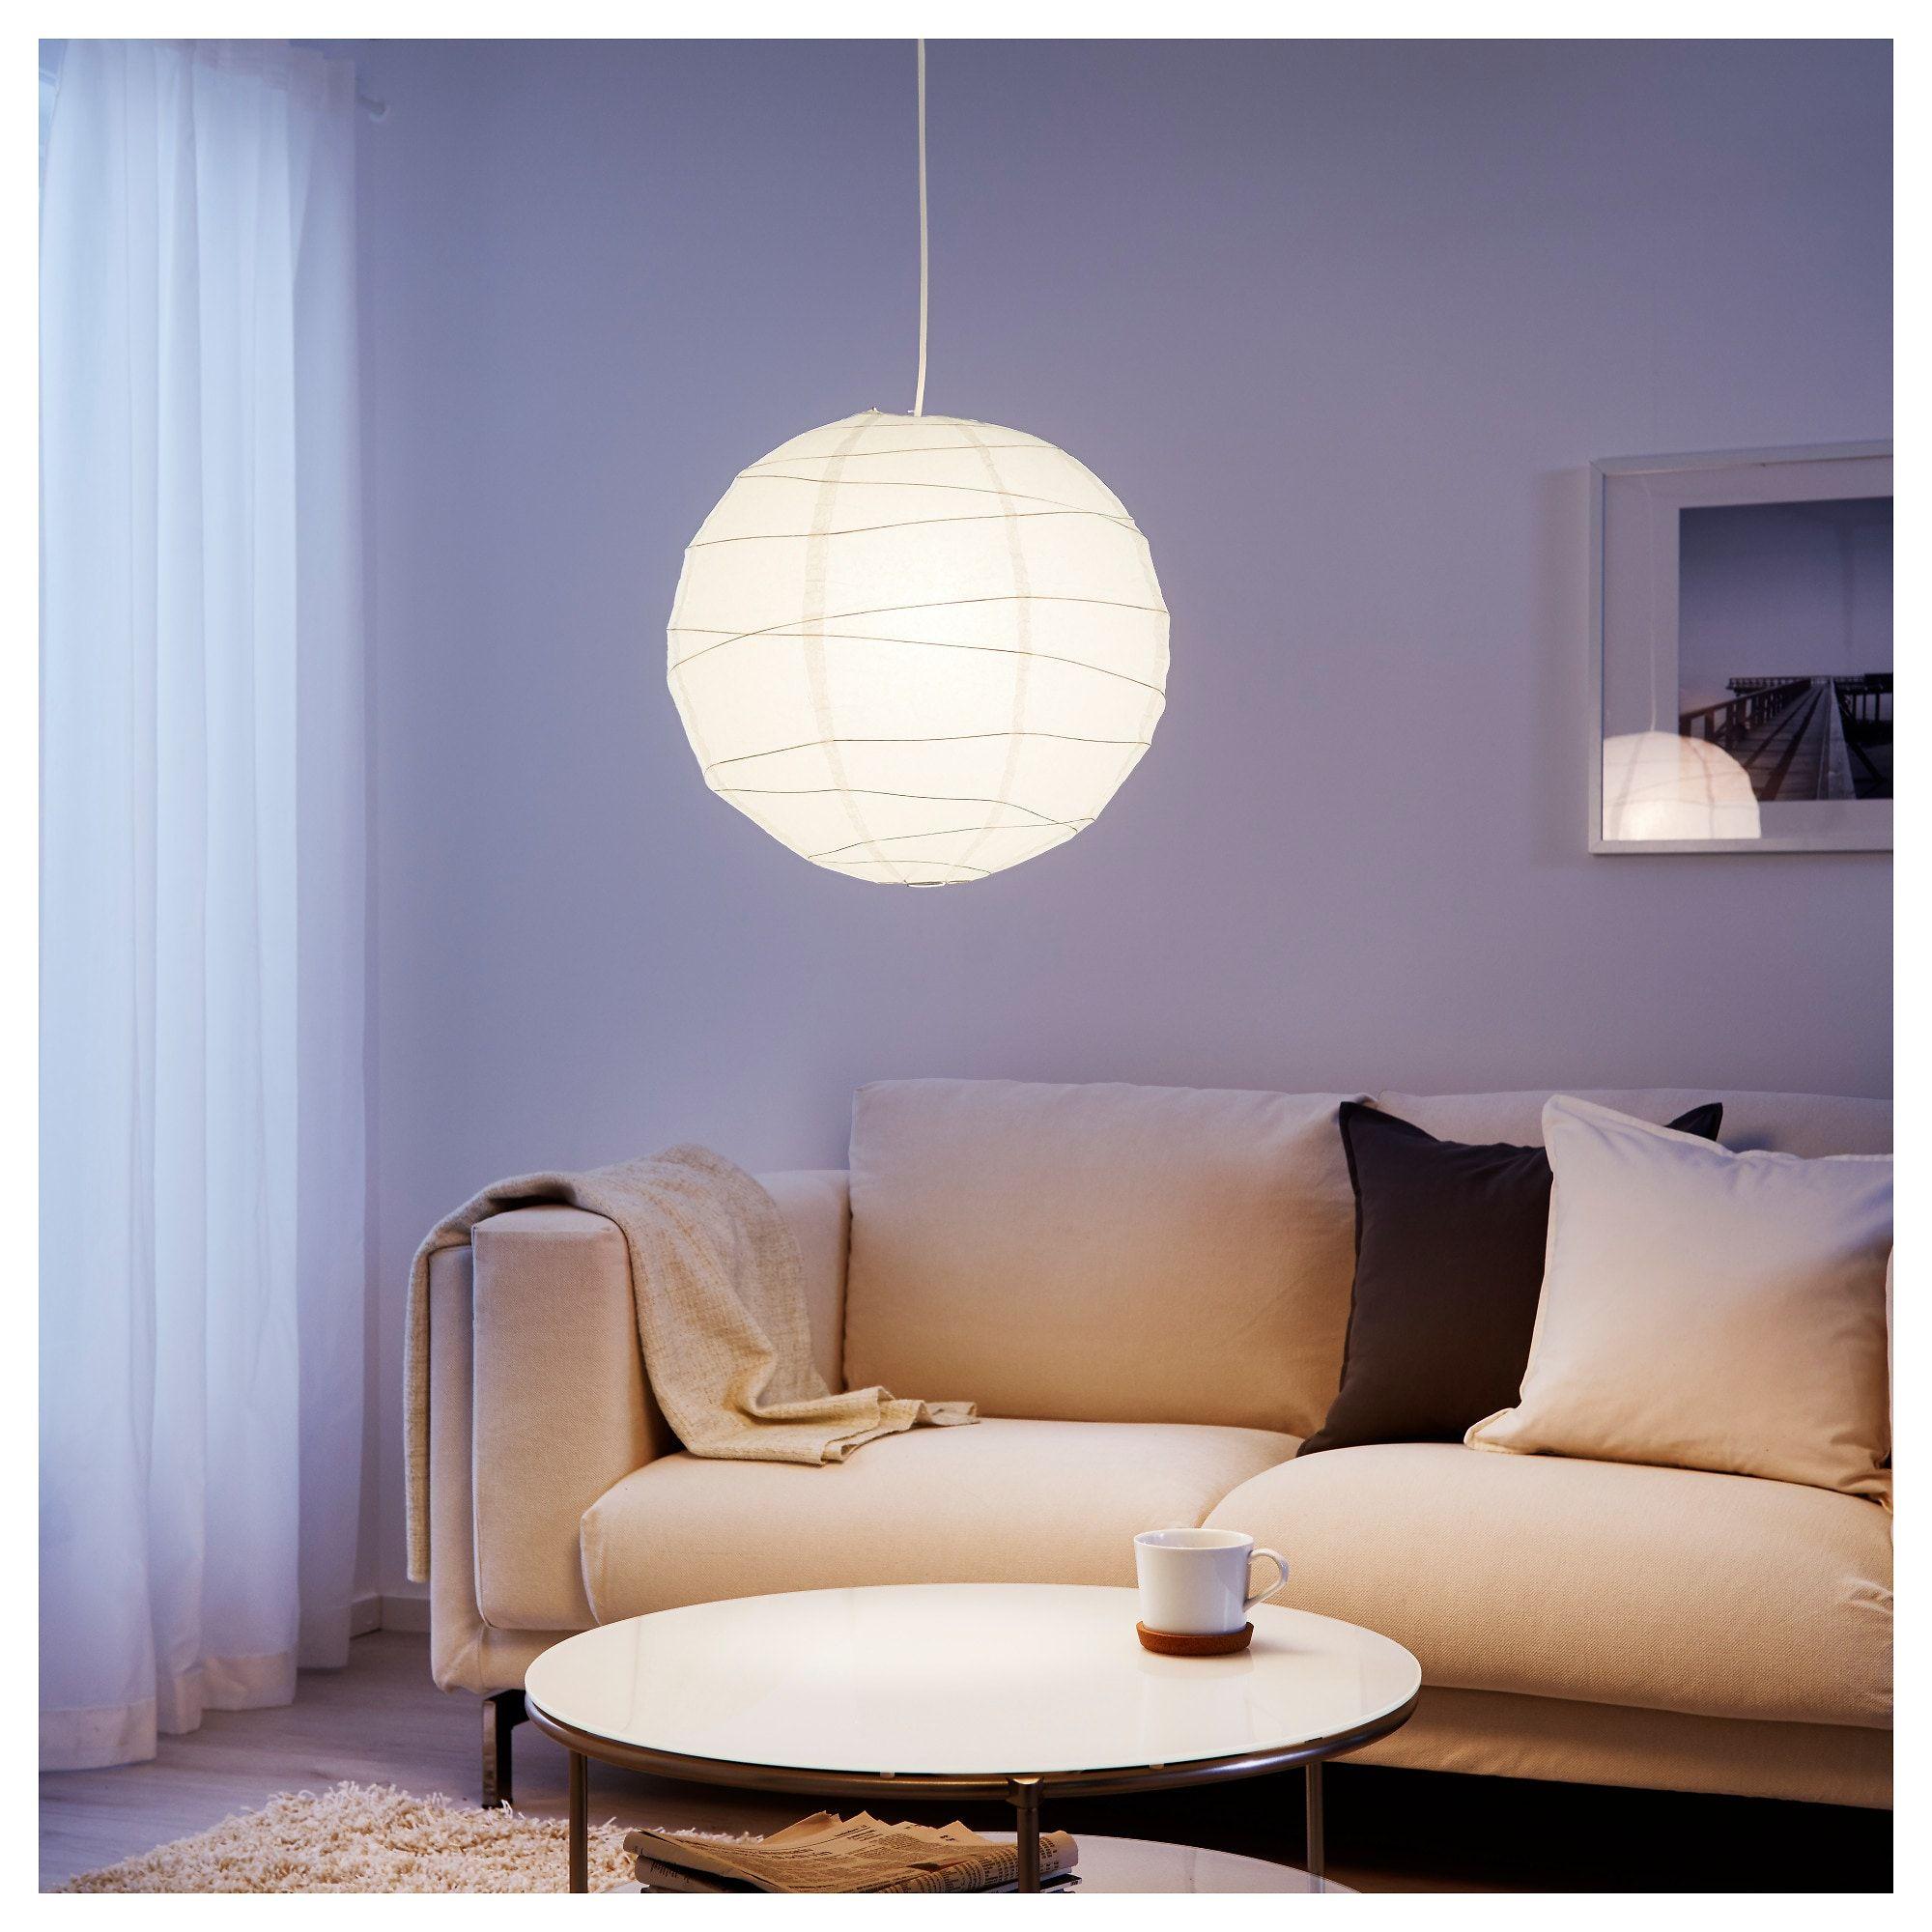 IKEA REGOLIT Pendant lamp shade white Pendant lamp